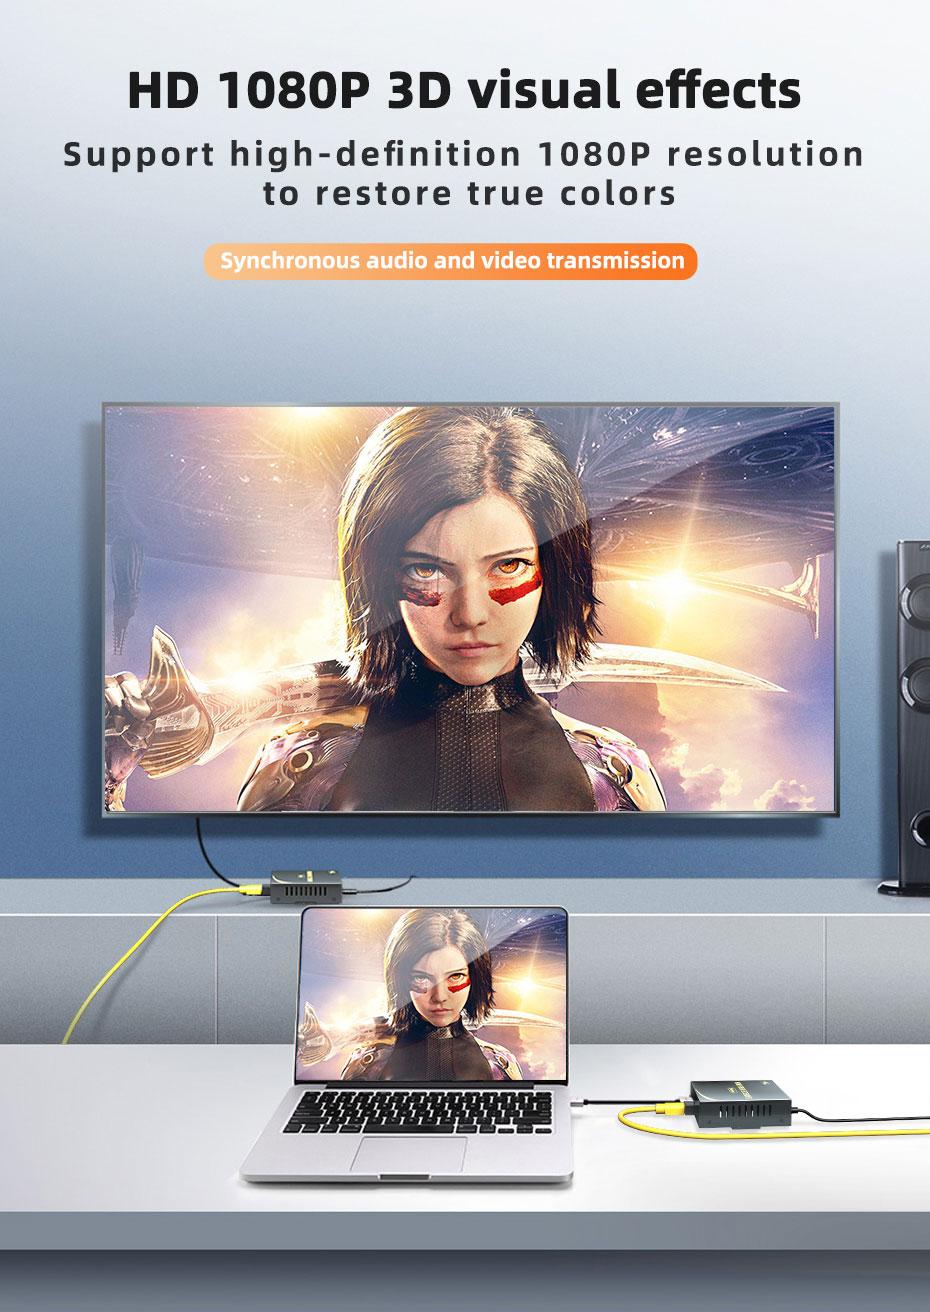 HDMI fiber extender supports 1080p HD resolution